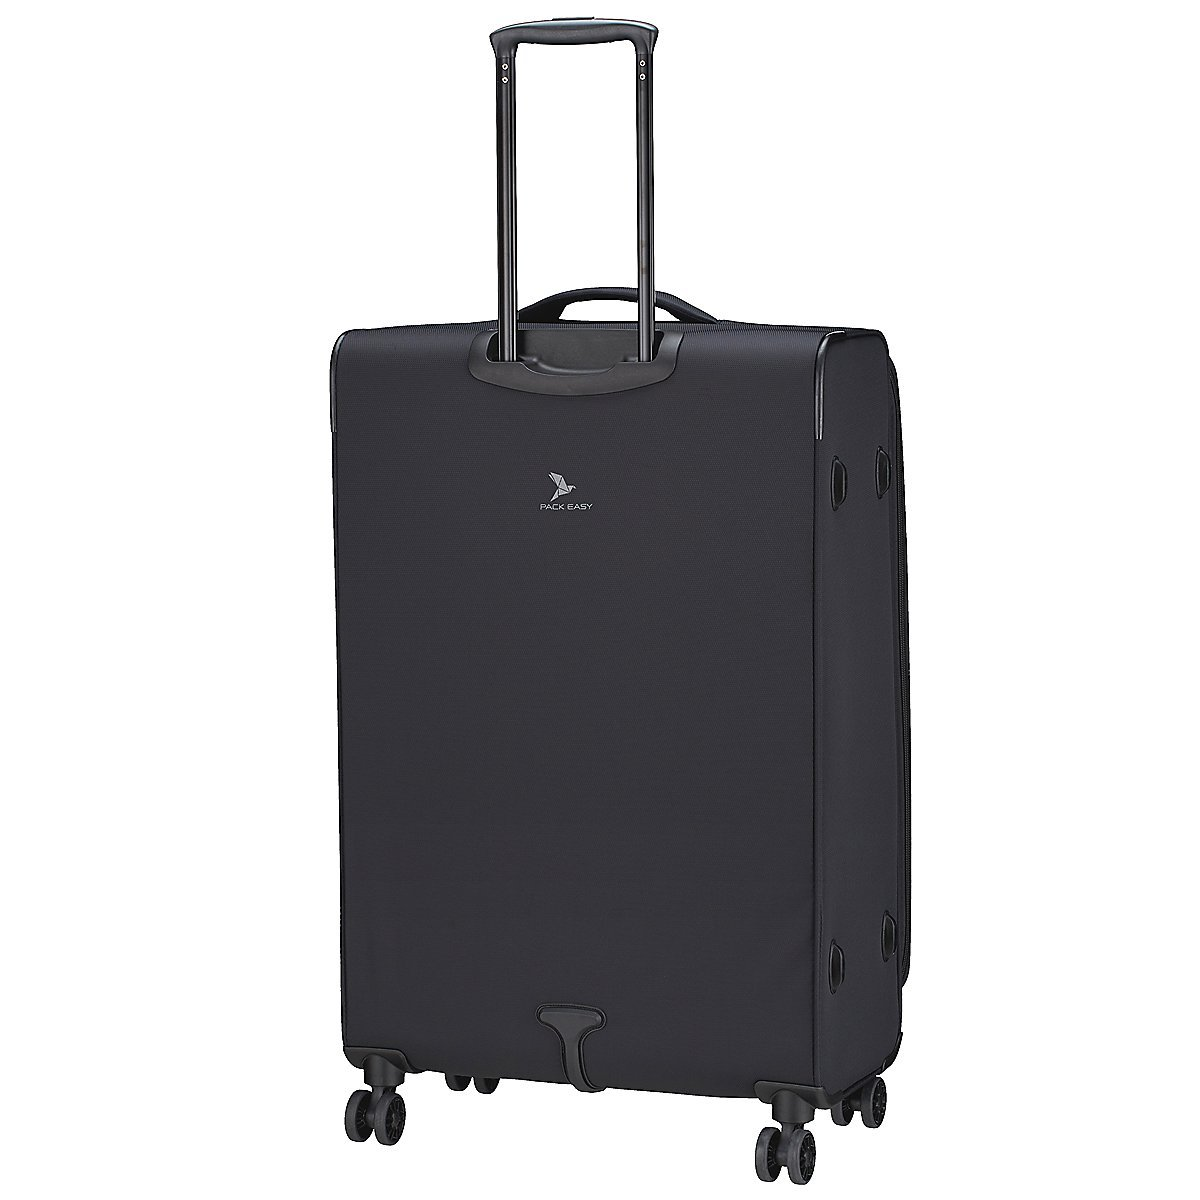 Pack Easy - Maleta, Citadel (Azul) - 9155BL: Amazon.es: Equipaje